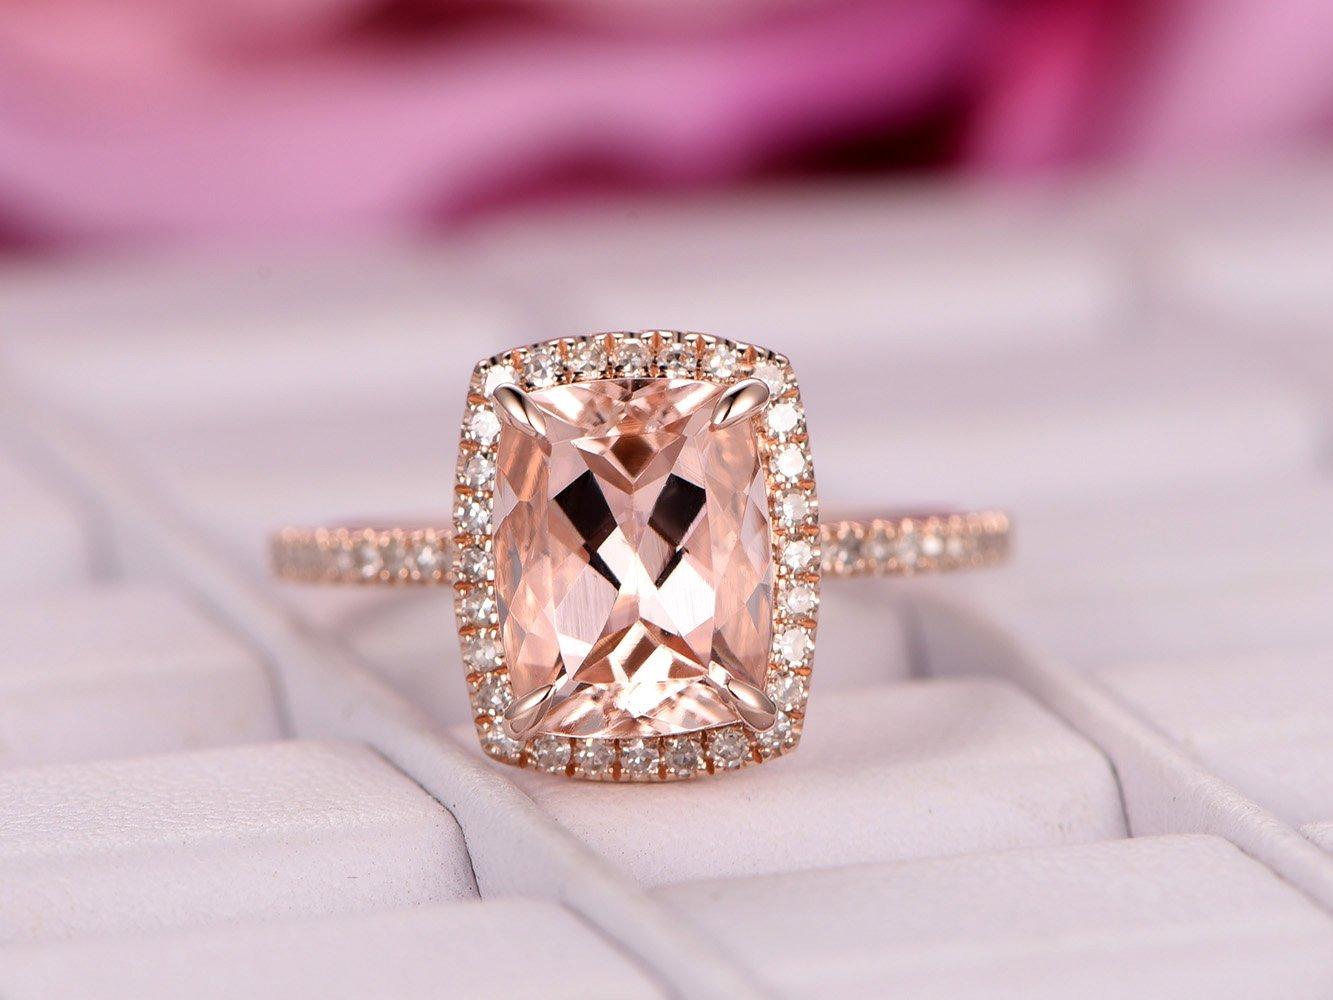 Amazon.com: Cushion Morganite Engagement Ring Pave Diamond Wedding ...